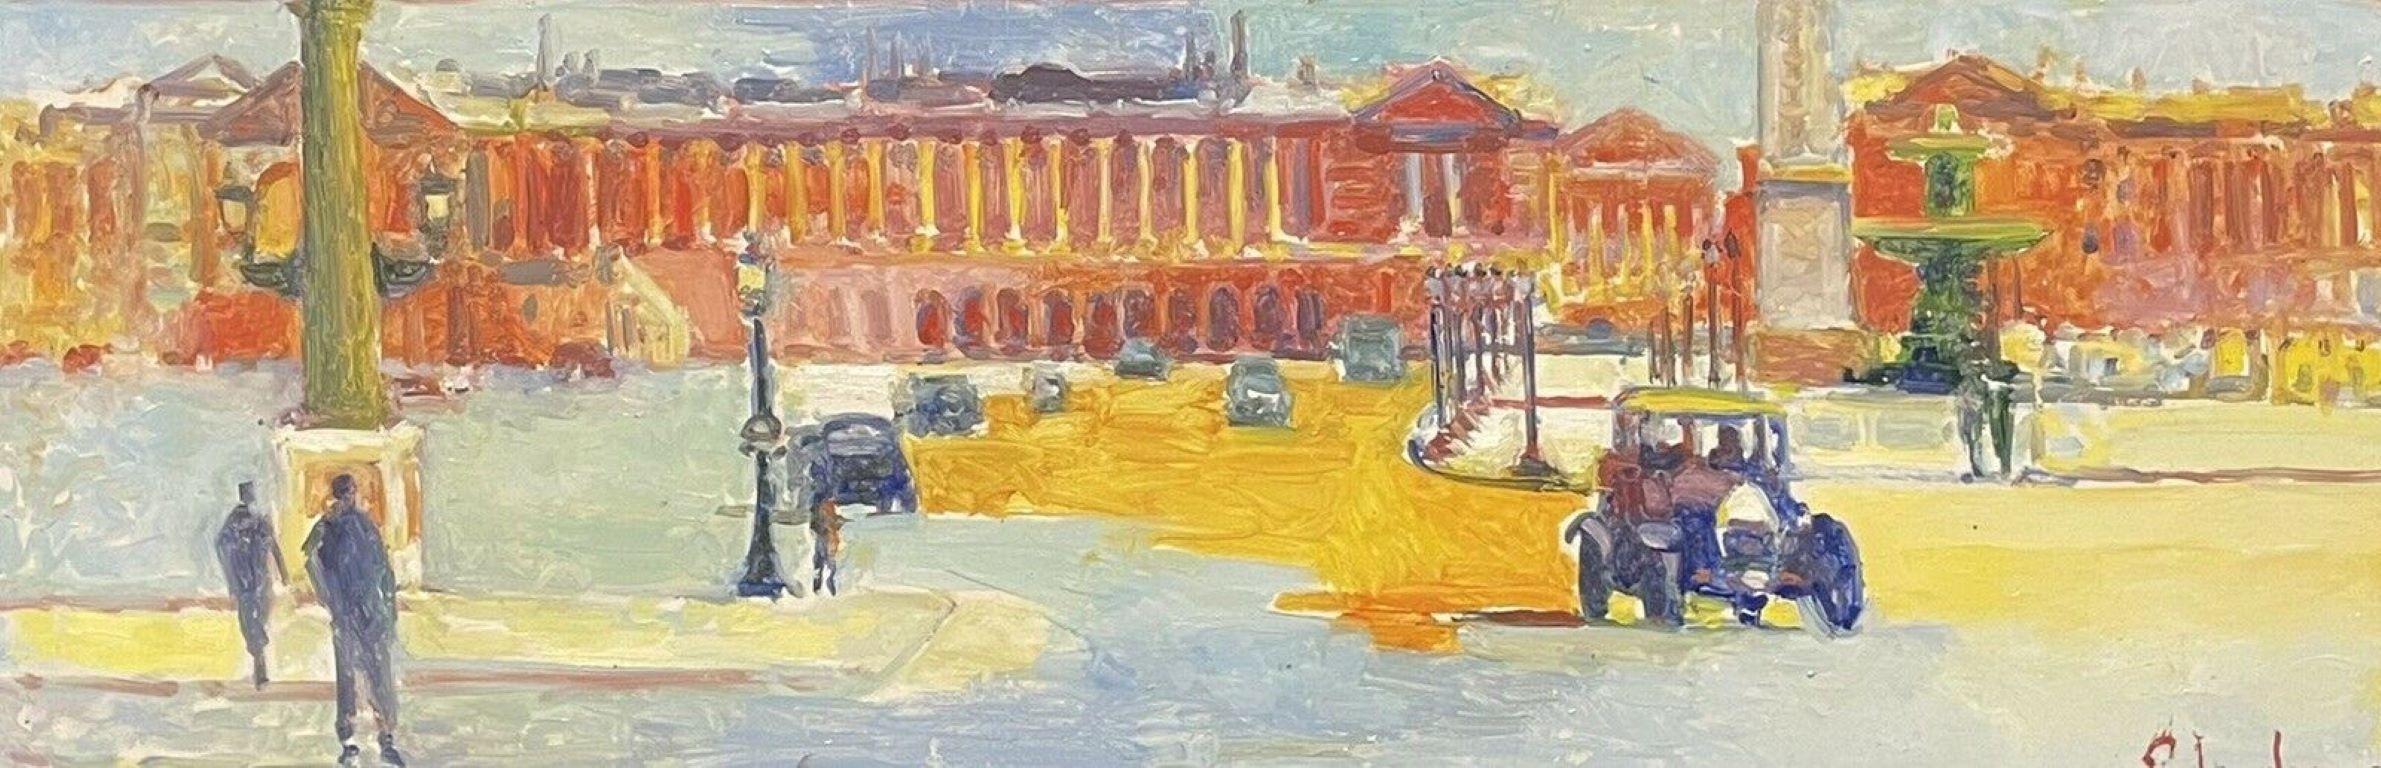 Large Signed French Impressionist Oil - Vintage Parisian City Street scene